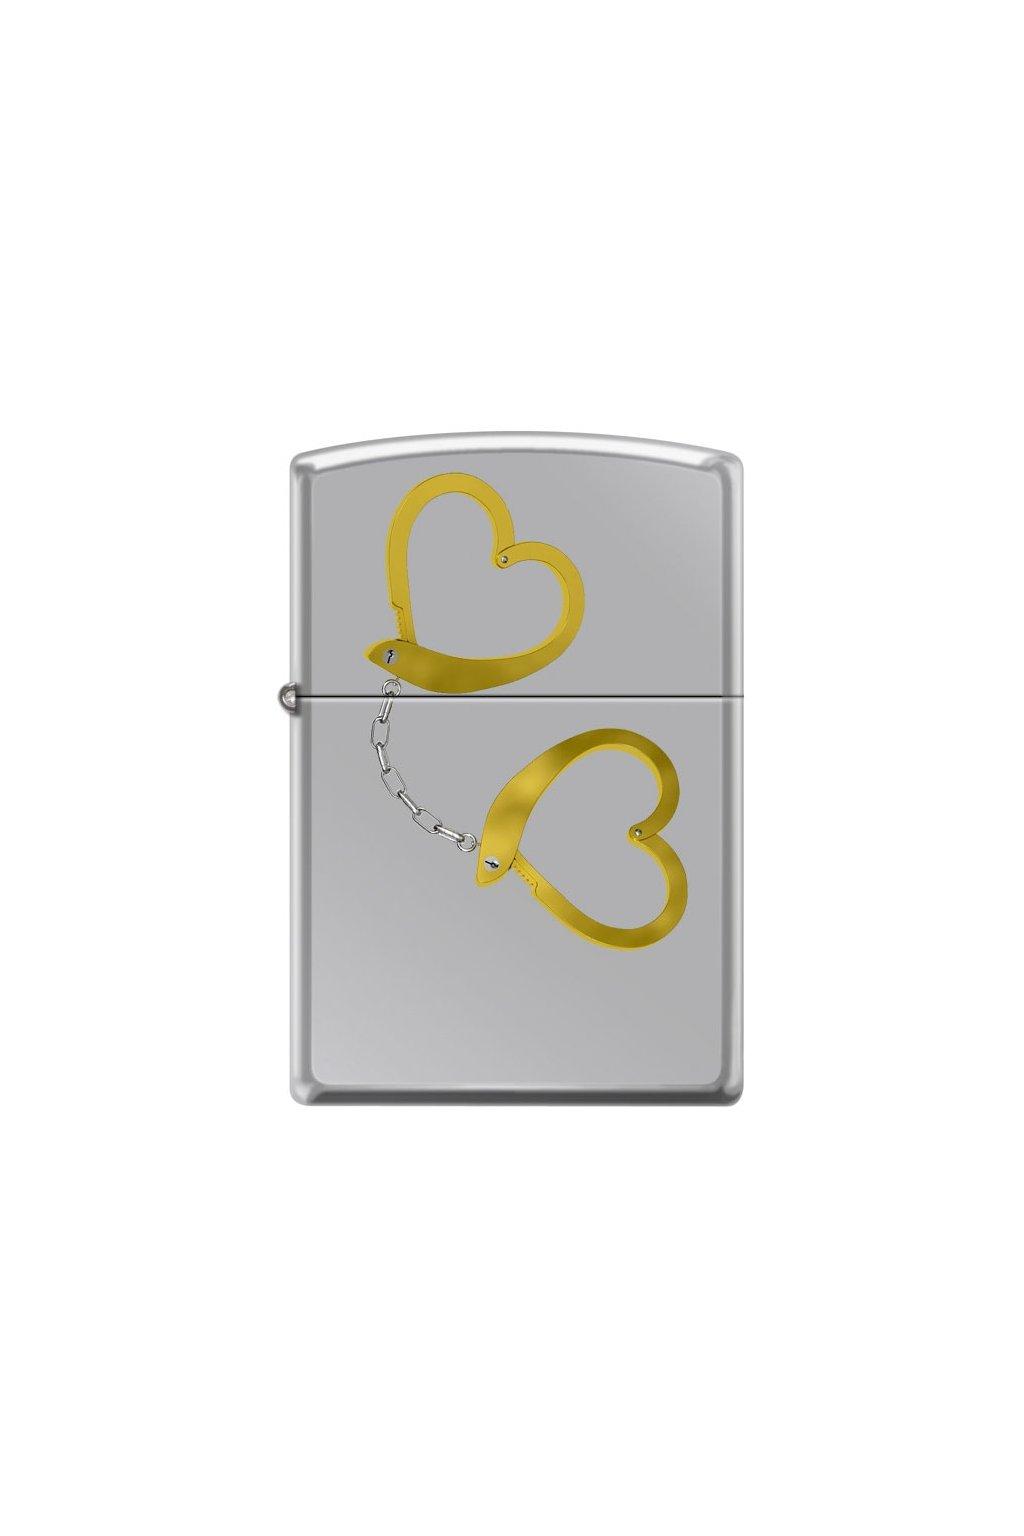 93281 zippo zapalovac 22028 handcuffs of love